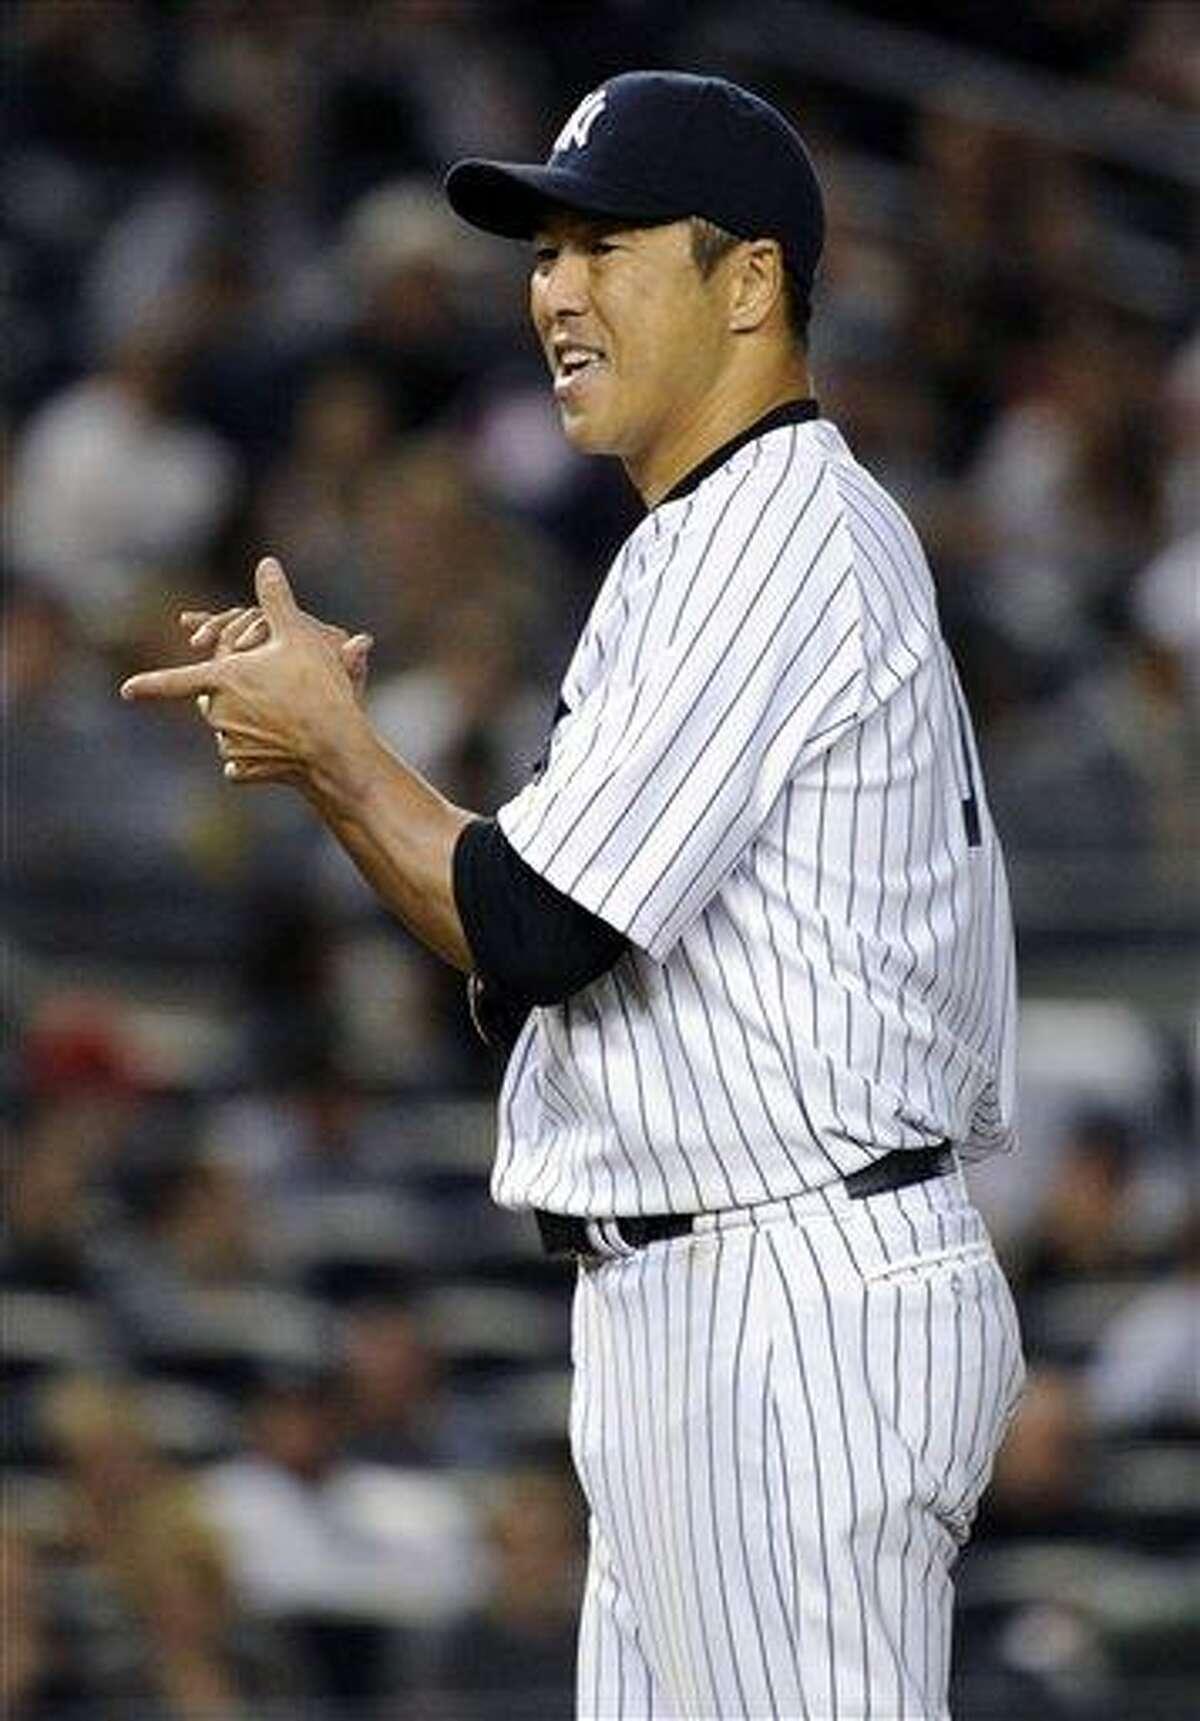 New York Yankees pitcher Hiroki Kuroda rubs up a new ball during the seventh inning of a baseball game against the Toronto Blue Jays Friday, May 17, 2013, at Yankee Stadium in New York. (AP Photo/Bill Kostroun)